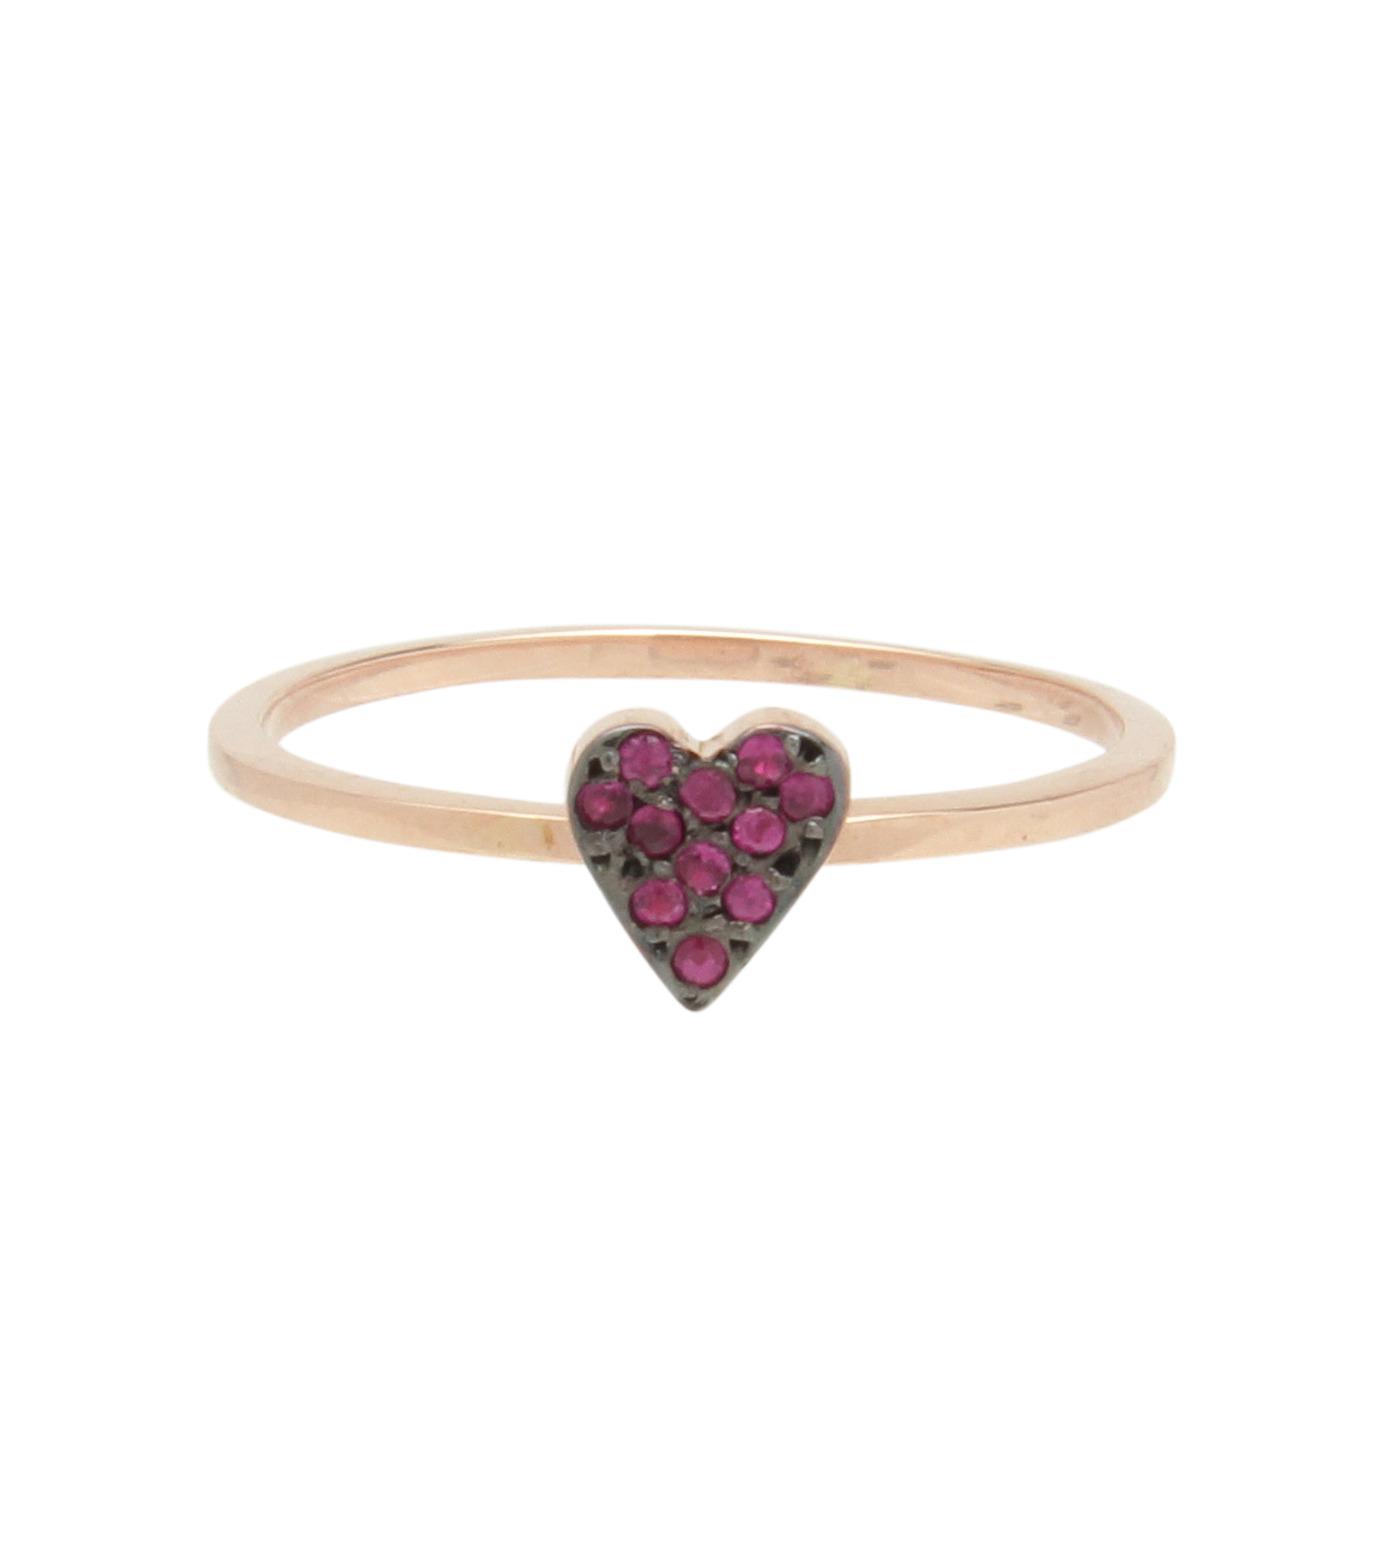 Ileana Makri(イリーナ マクリ)のLove Ring Pink Gold-Ruby-ROSE(リング/ring)-O272-39-006-75 拡大詳細画像1